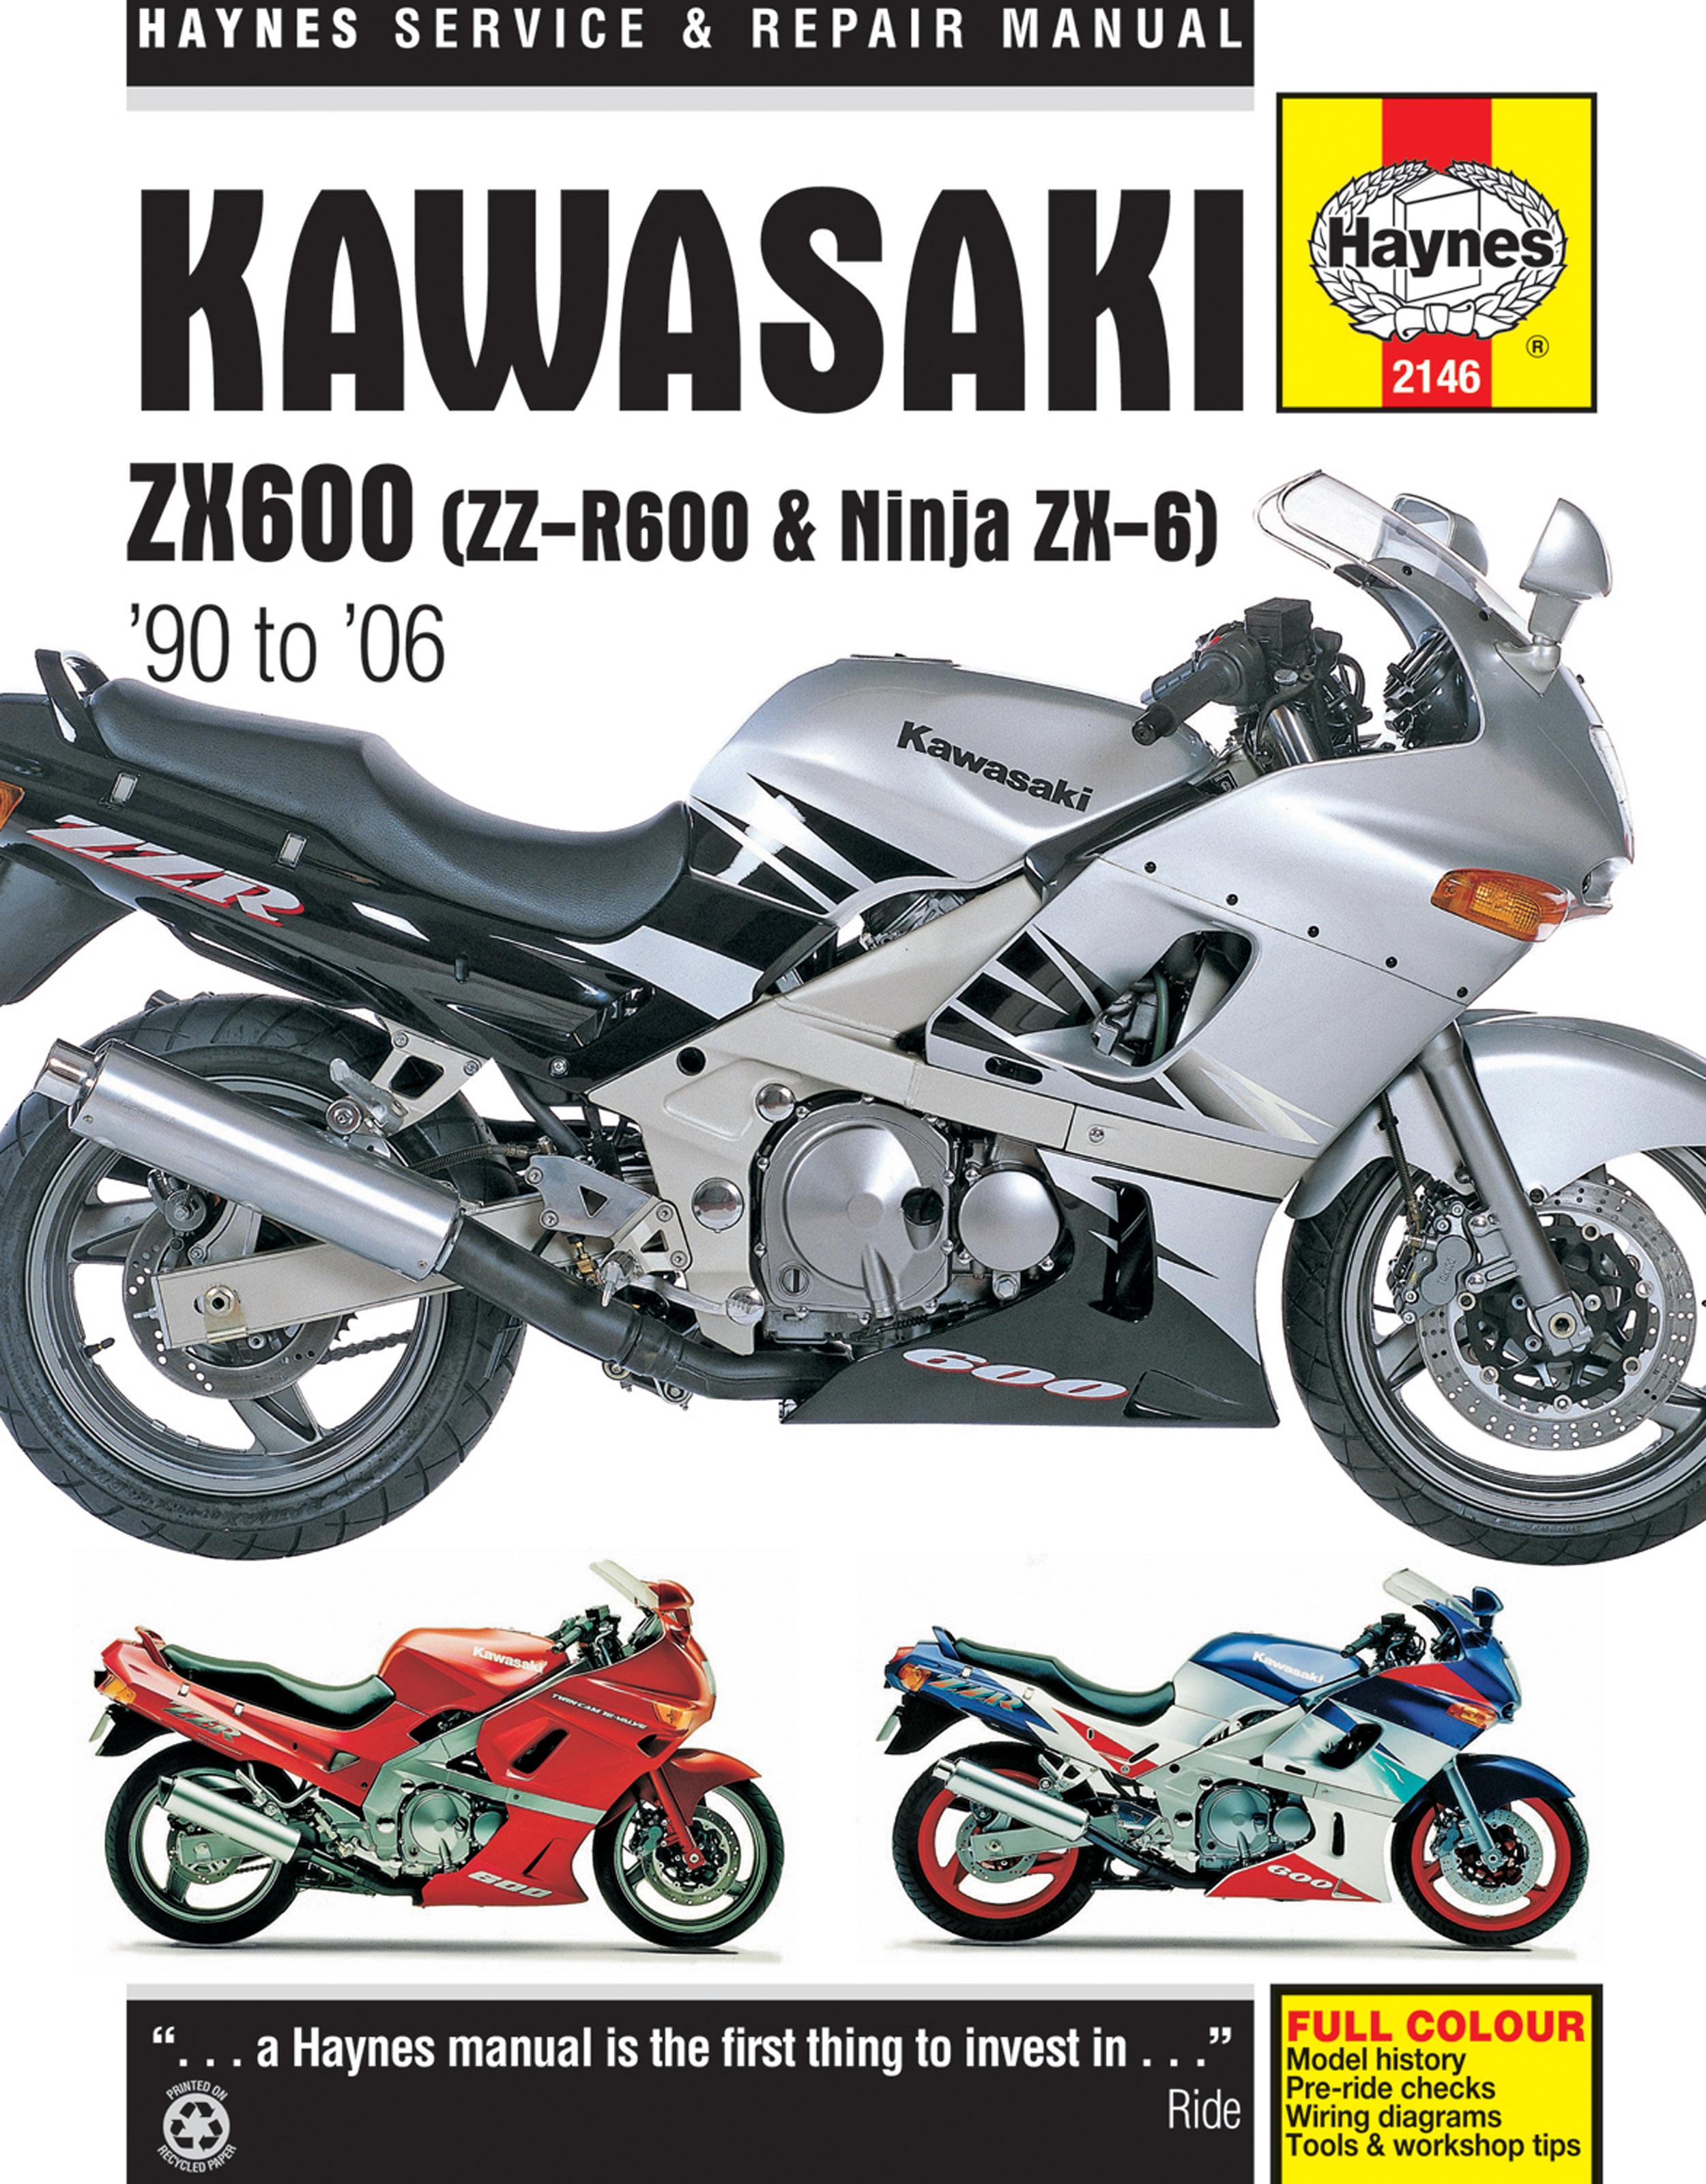 Kawasaki ZX600, ZZ-R600 & Ninja ZX-6 (90-06) Haynes Repair Manual